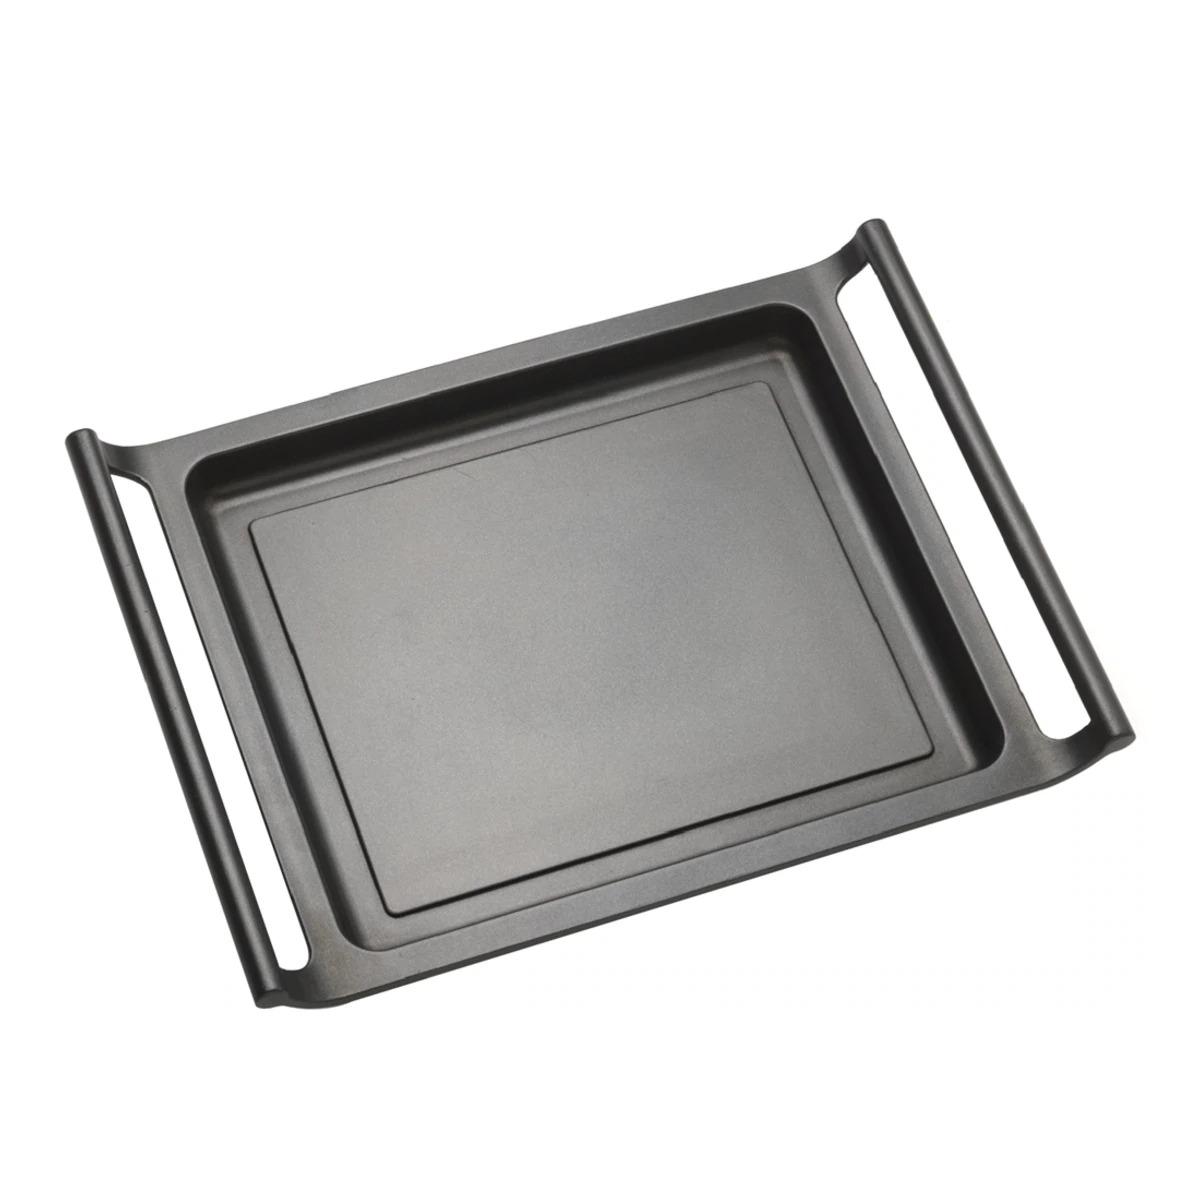 Efficient BRA grill plate